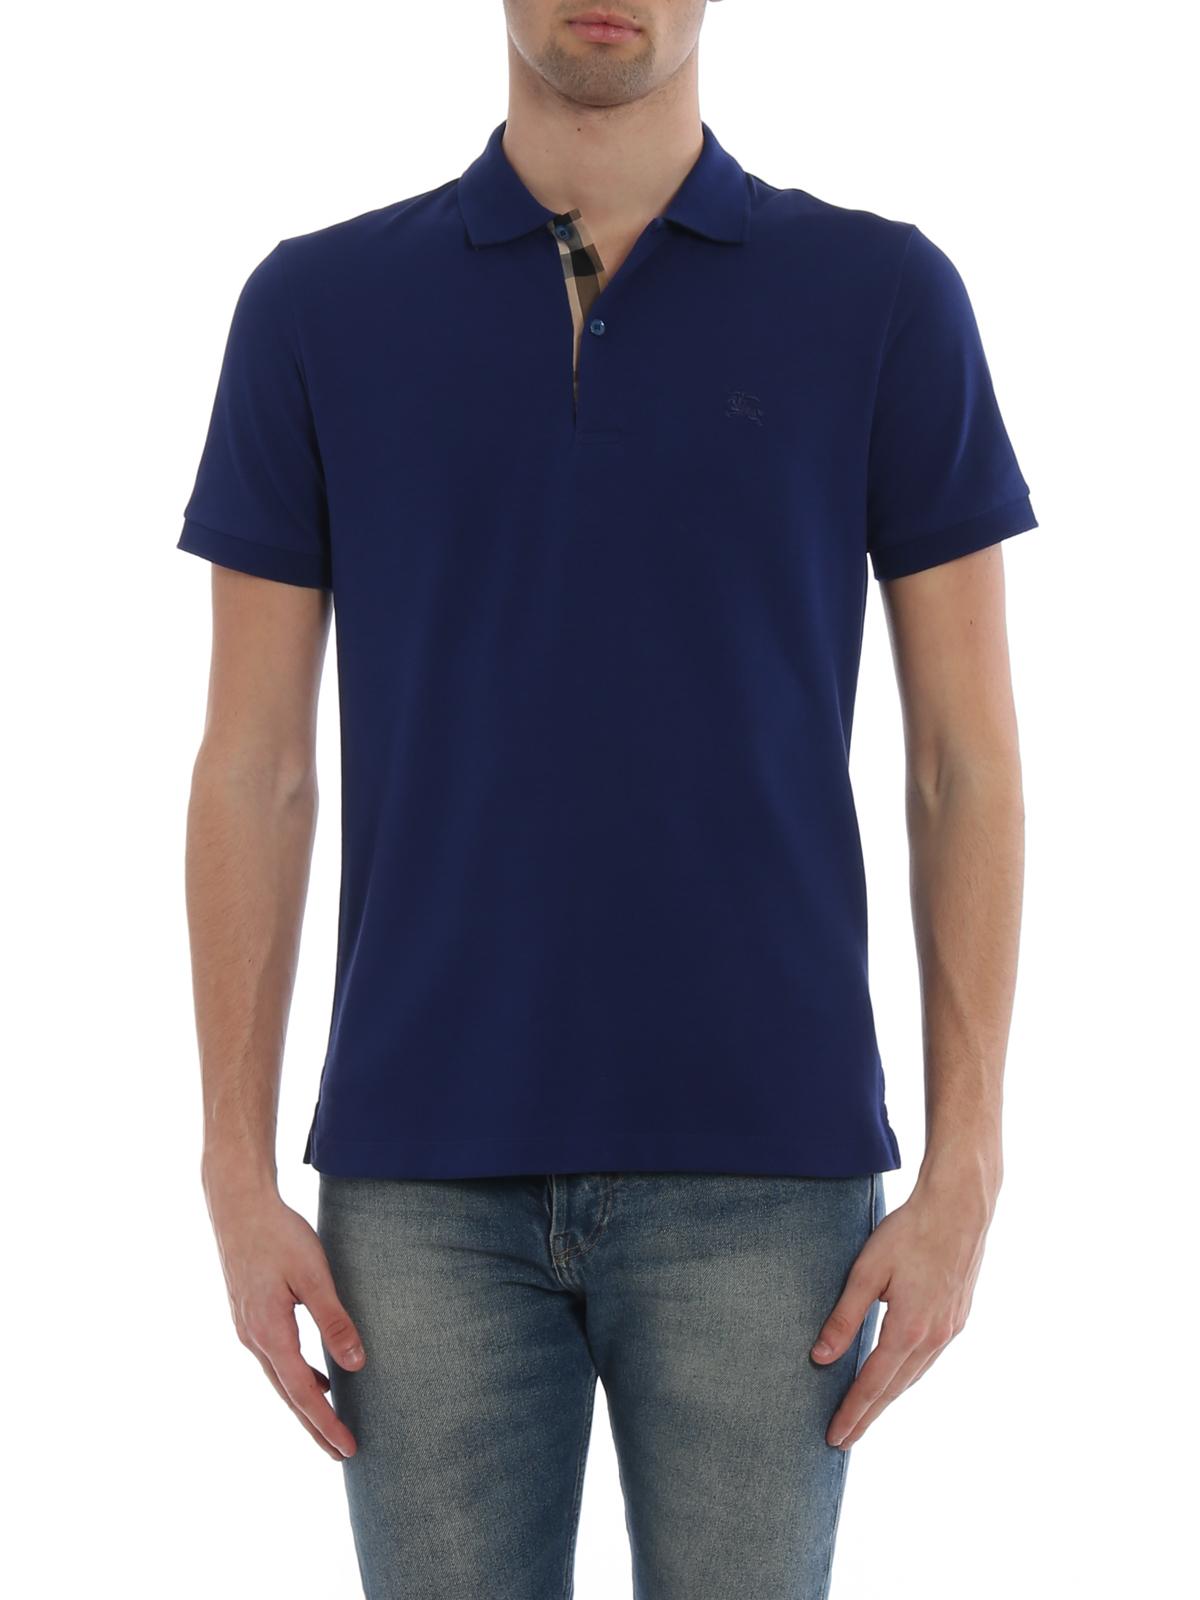 Burberry Oxford Blue Cotton Polo Shirt Polo Shirts 4068779